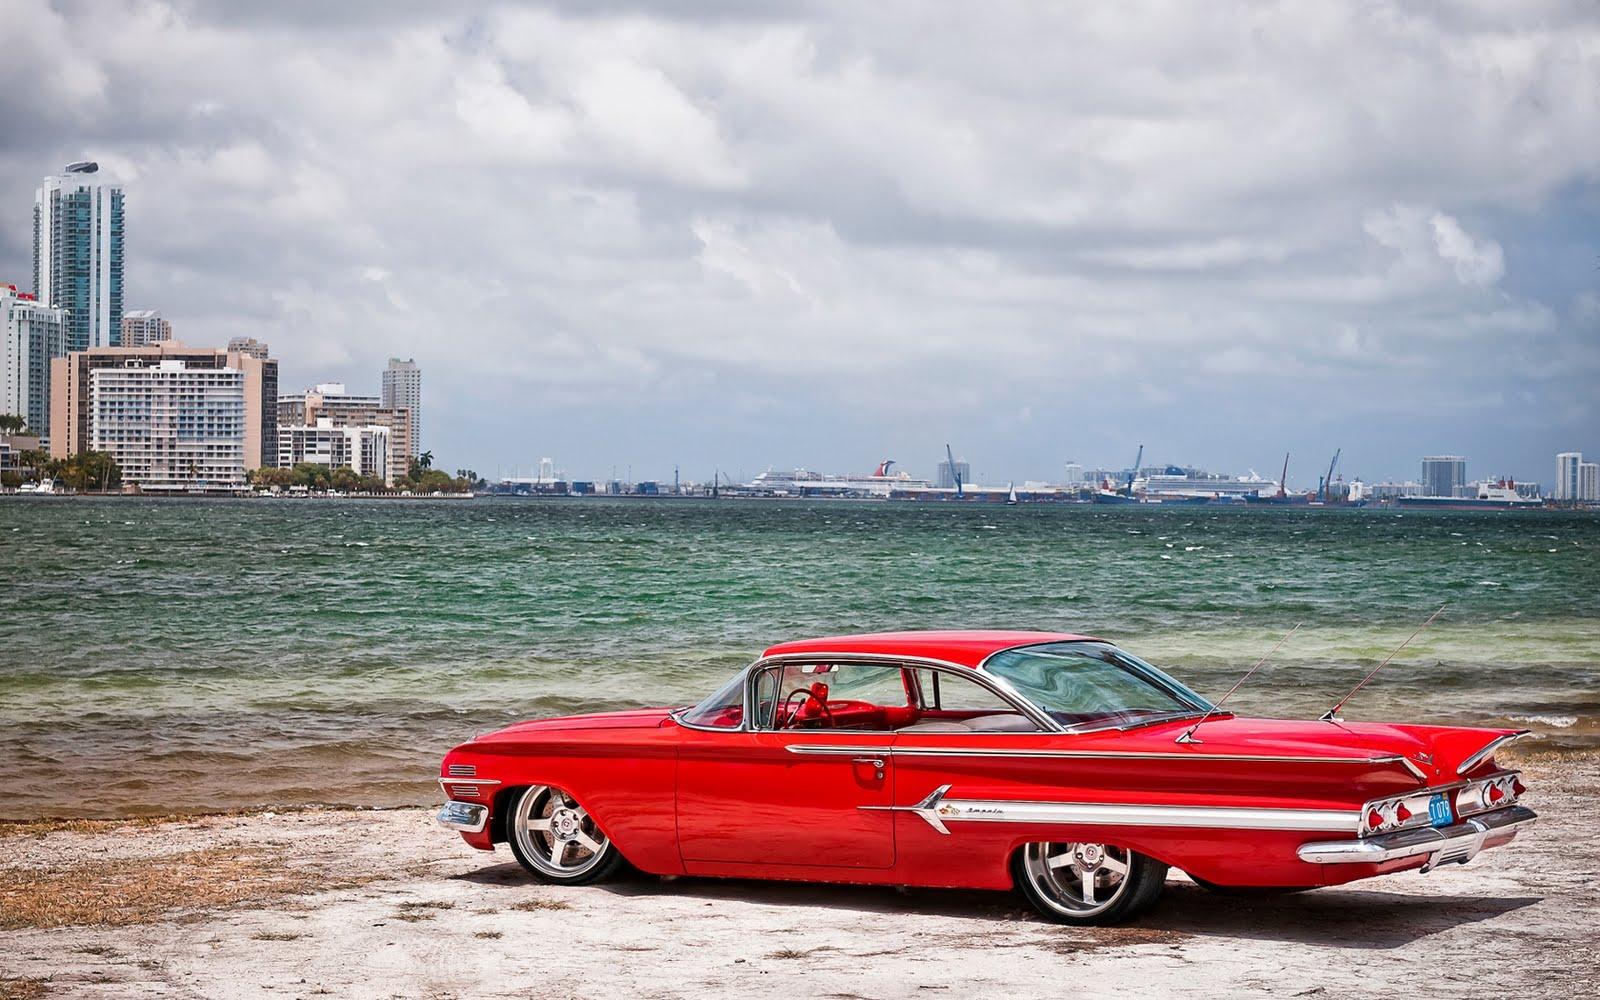 http://3.bp.blogspot.com/-fDW34ywvyFo/TnPcqqCzwSI/AAAAAAAAApg/fZCXDilycp0/s1600/1960+Chevy+Impala+Chevrolet+Car+Photos+-+PremiumWallpapersHD.Blogspot.Com.jpg